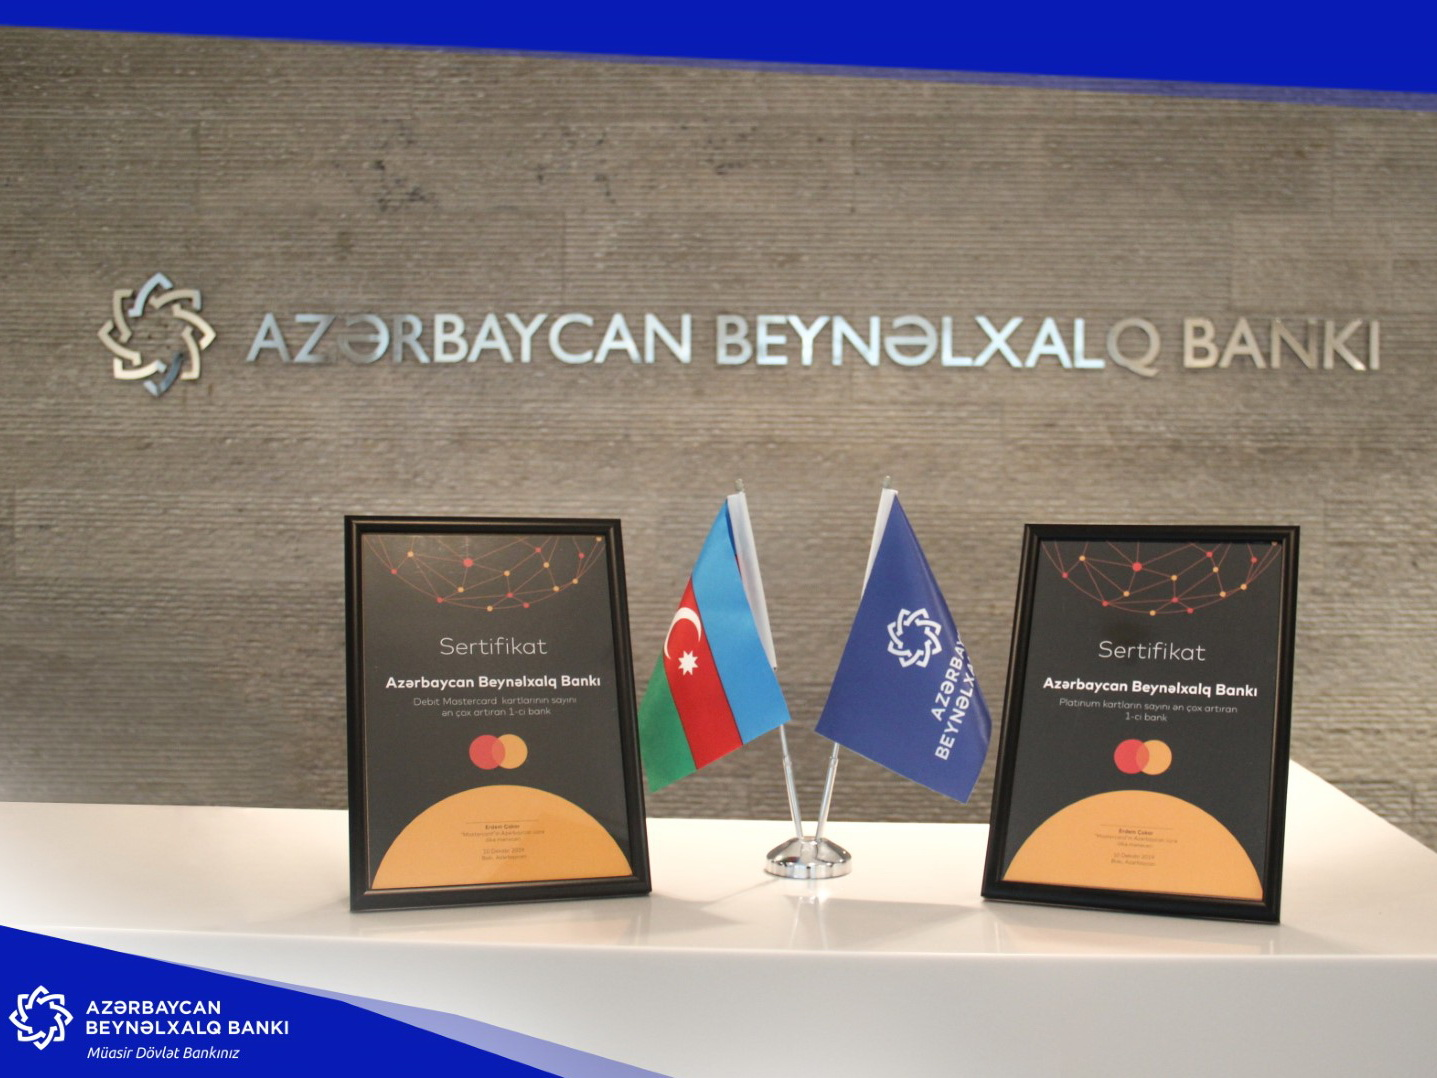 MasterCard вручила Международному банку Азербайджана две награды